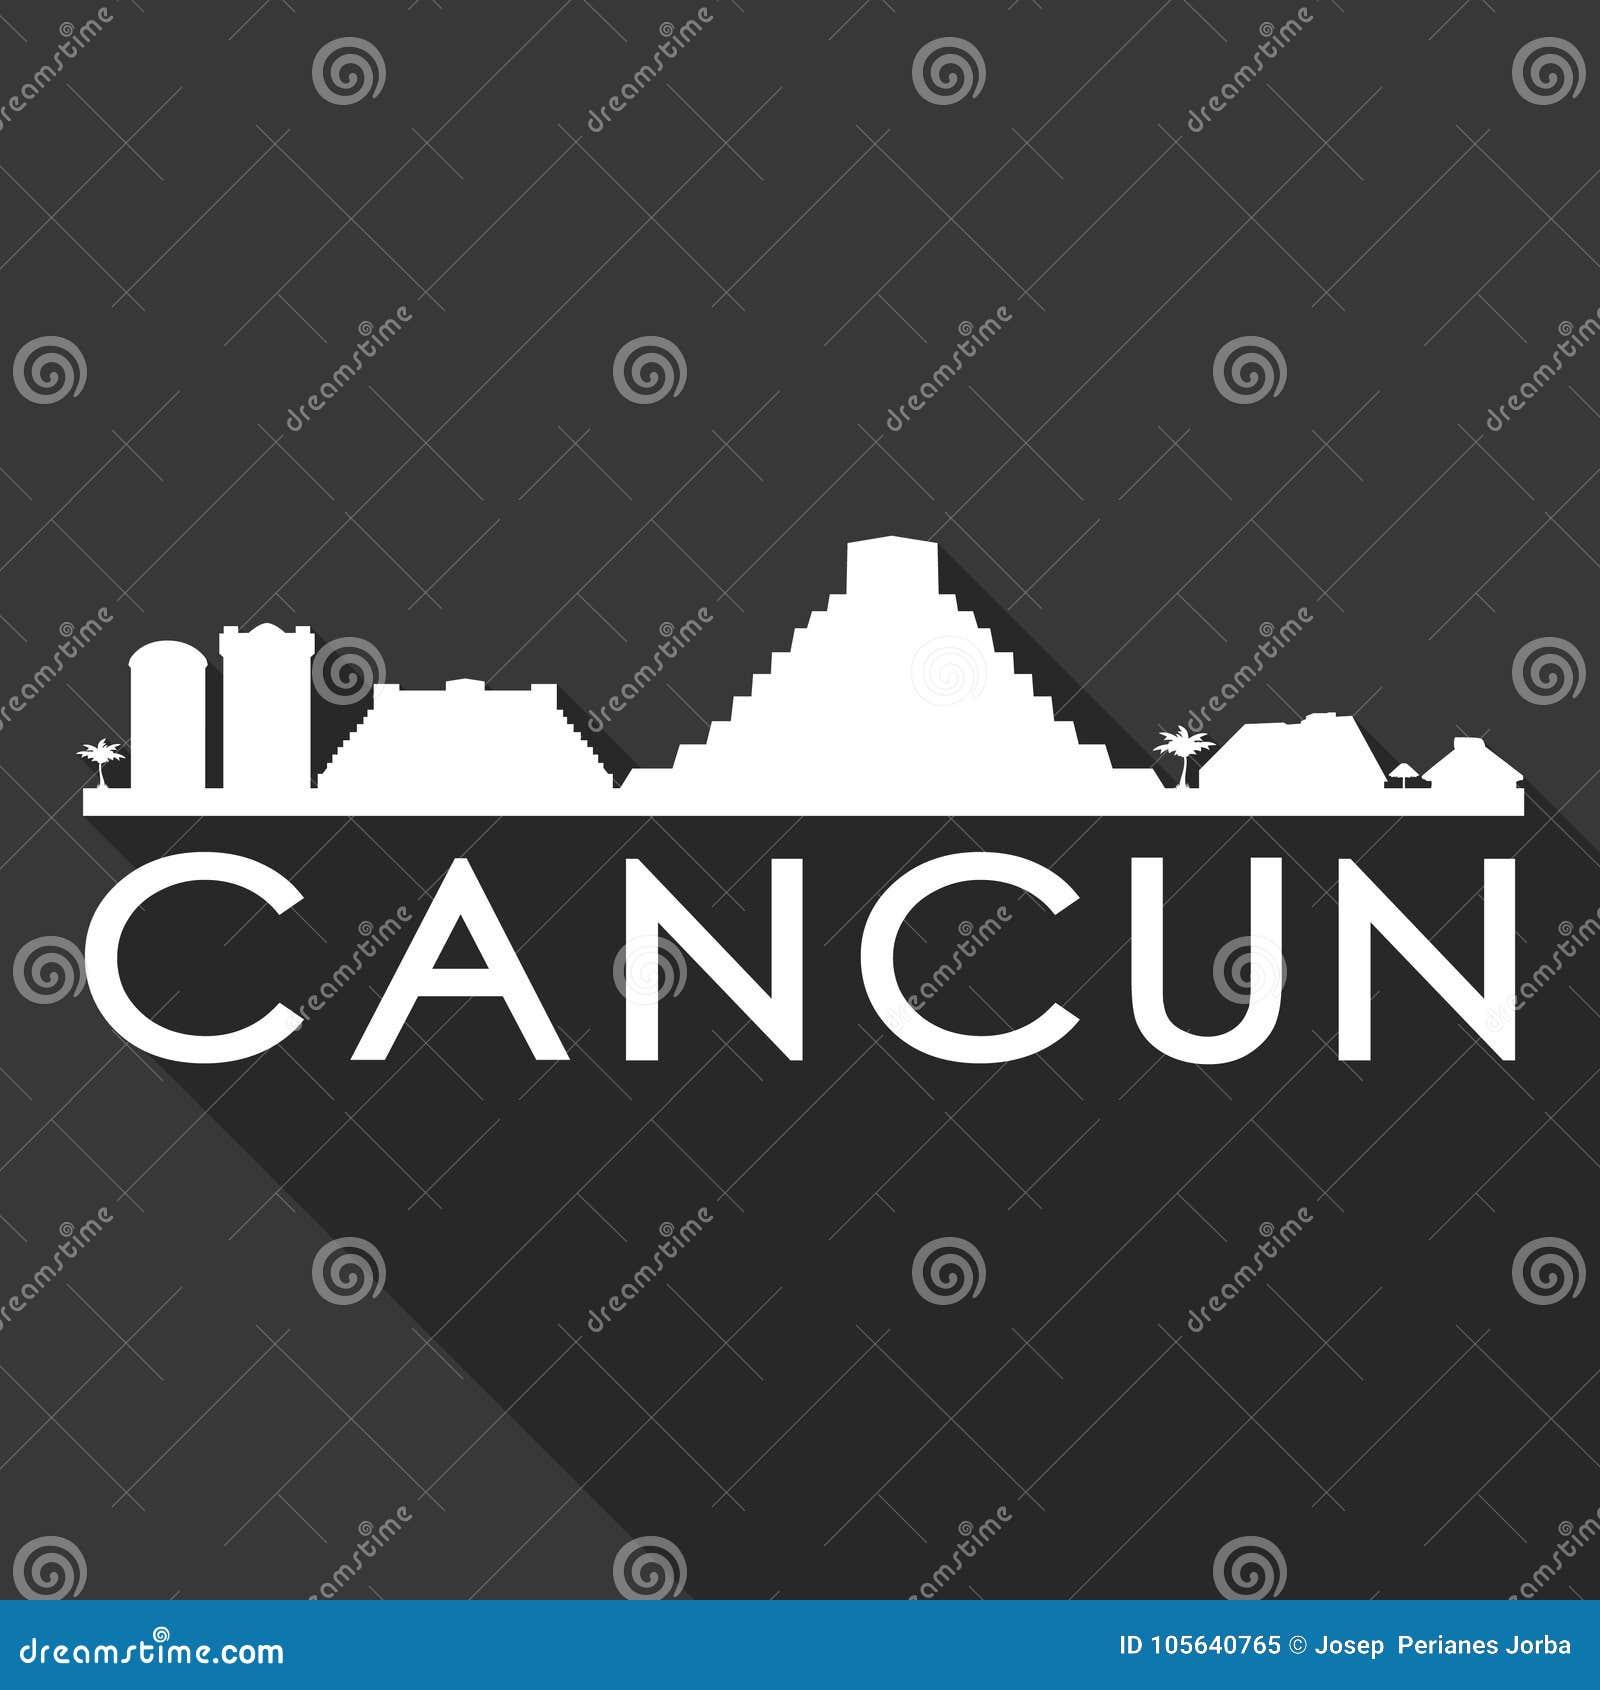 Cancun Mexico North America Icon Vector Art Flat Shadow Design